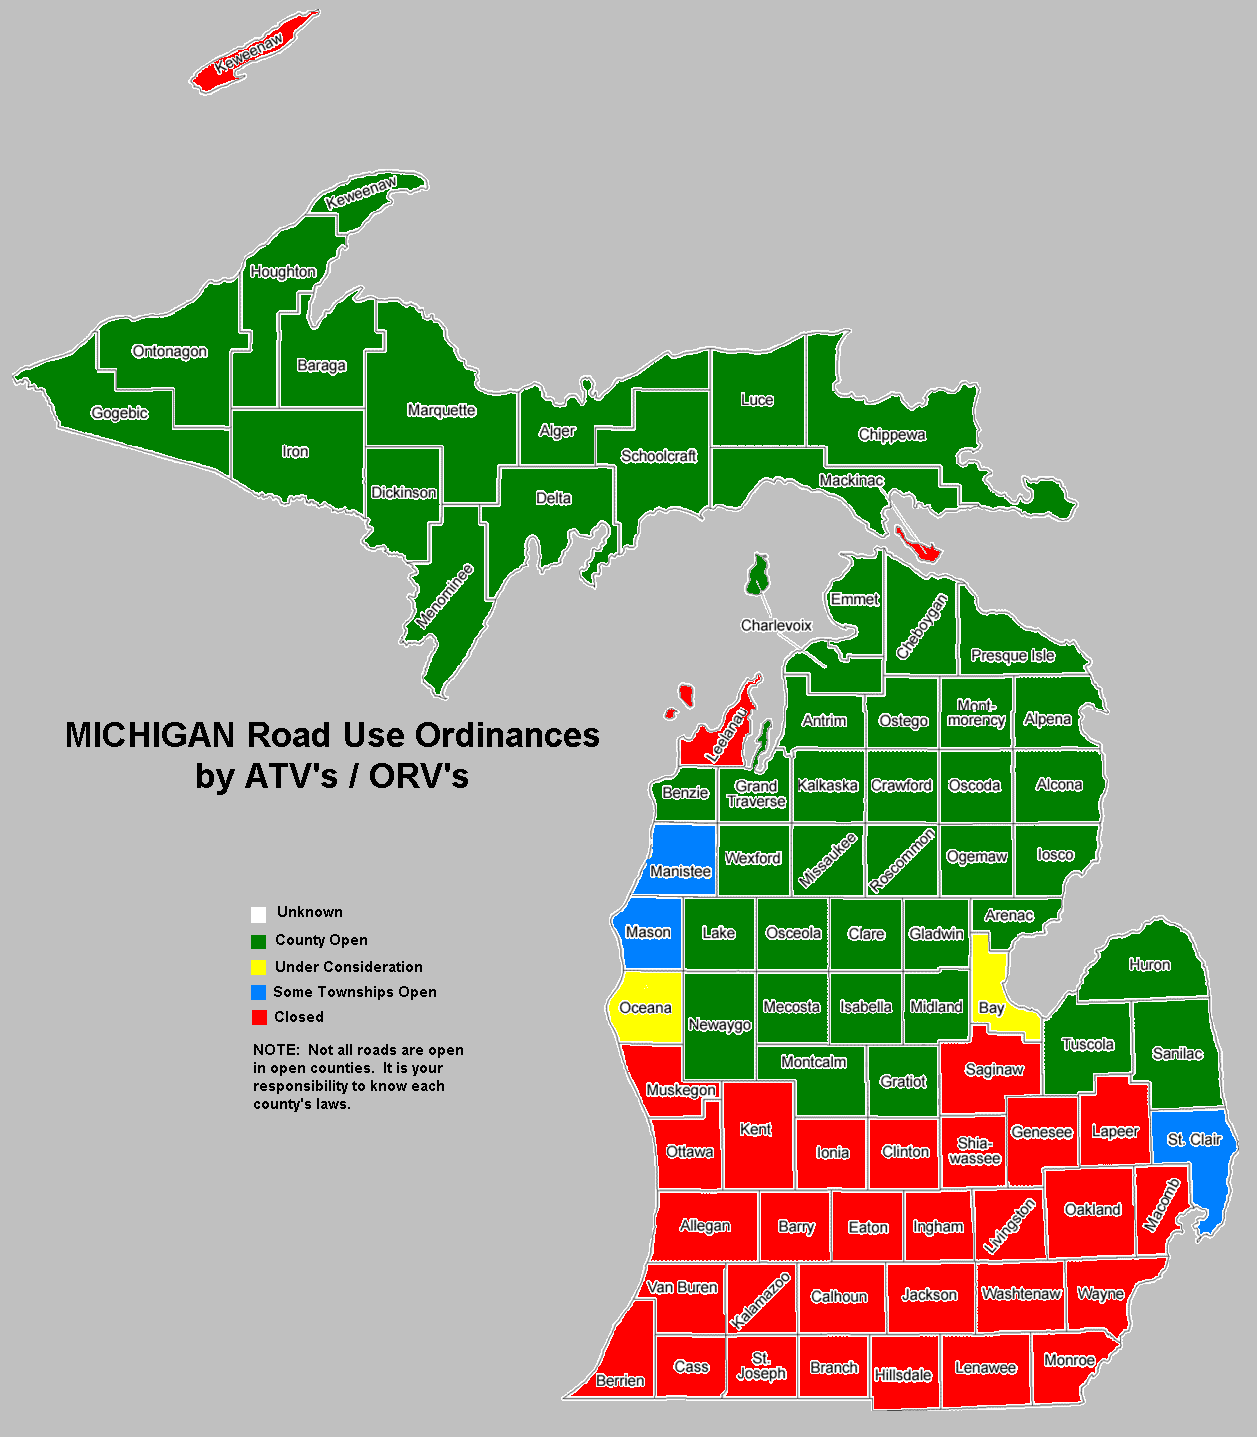 Michigan ORV regulations by county